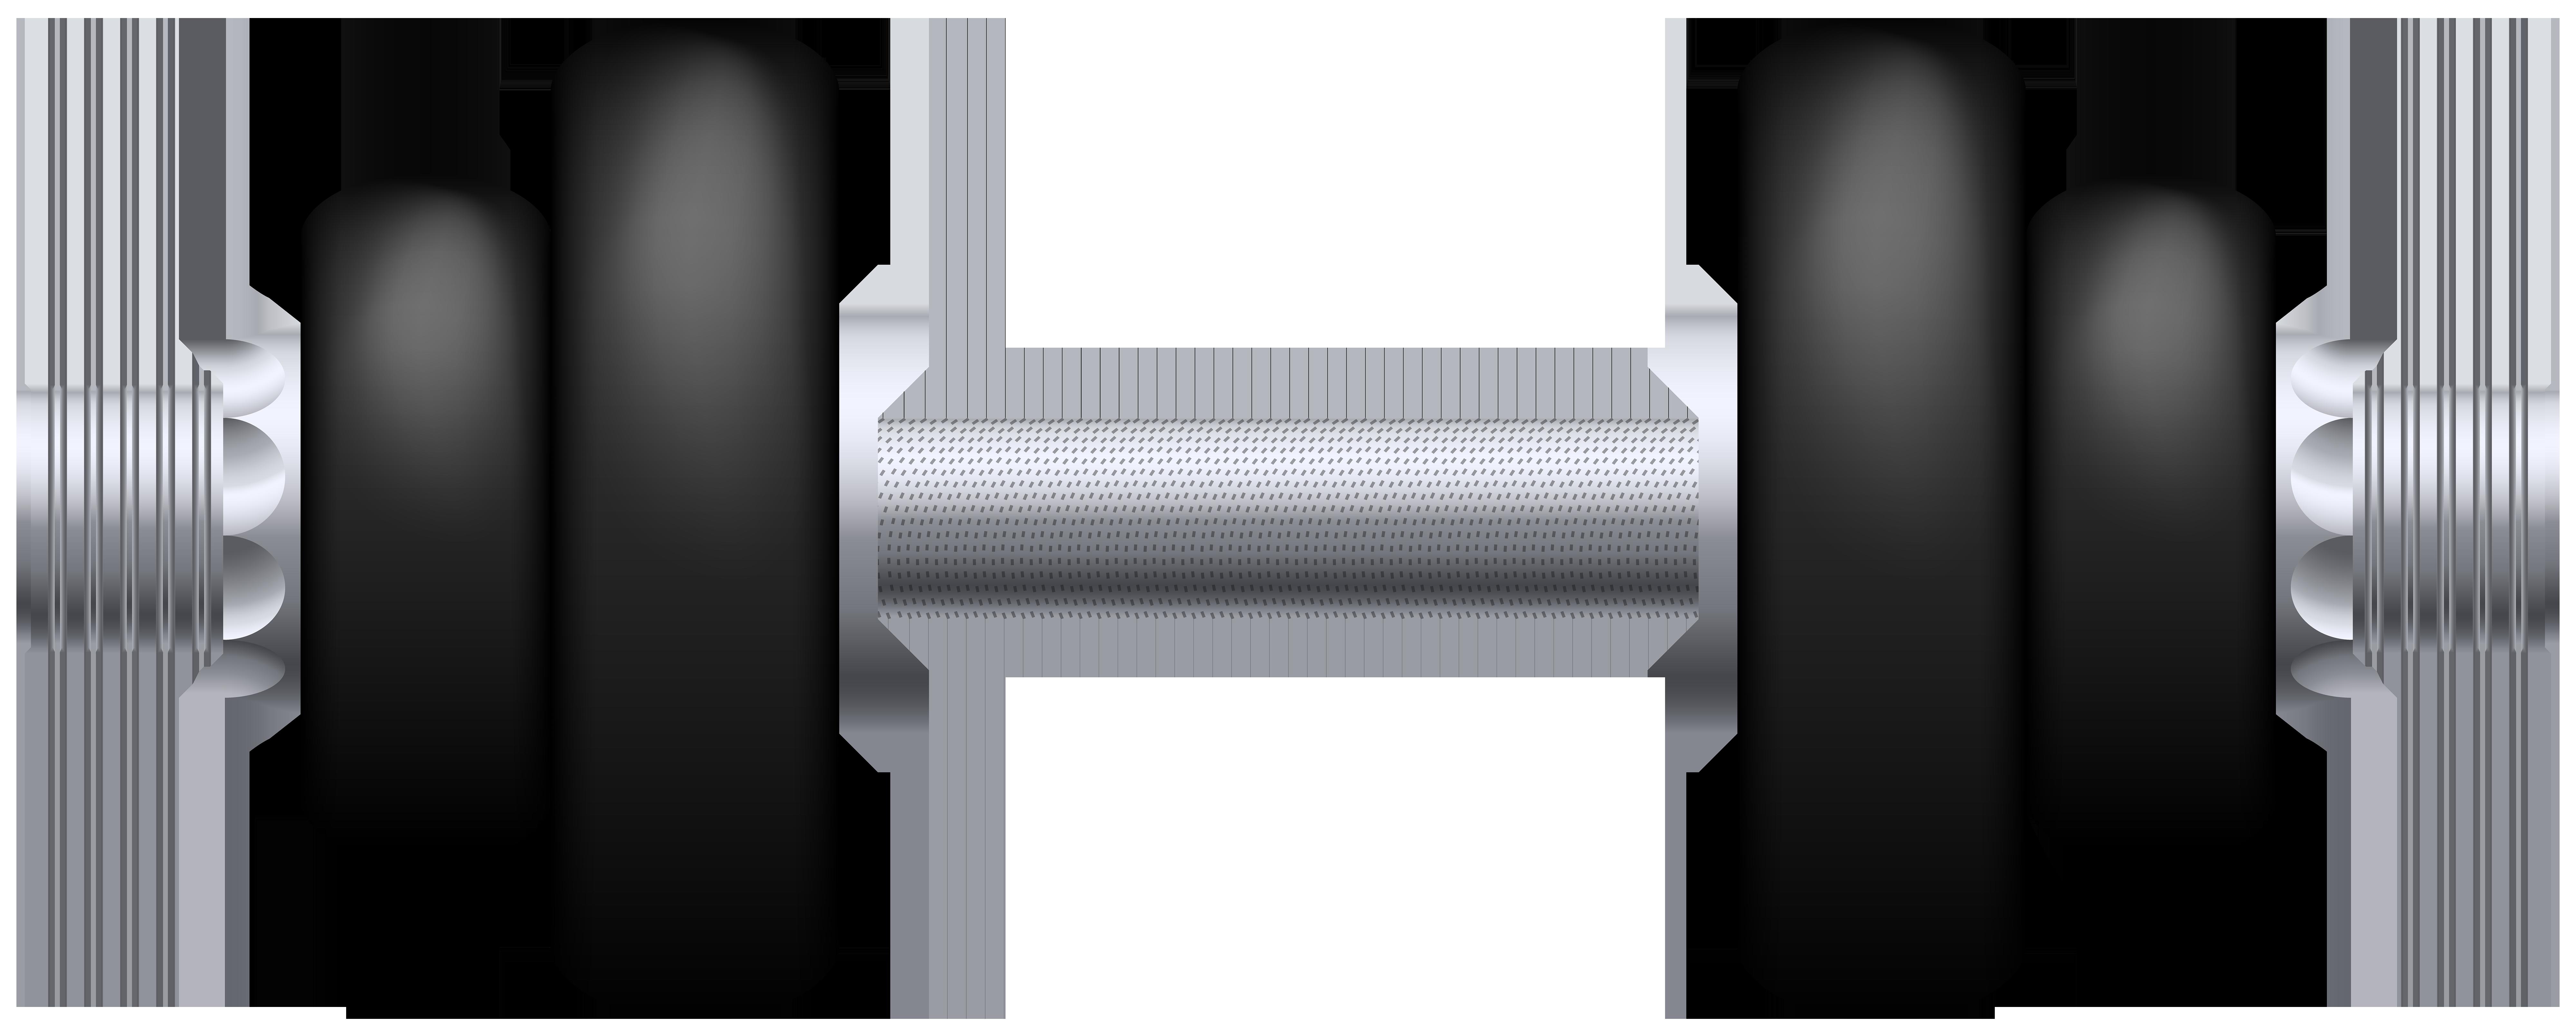 jpg stock Png clip art image. Dumbbells clipart.